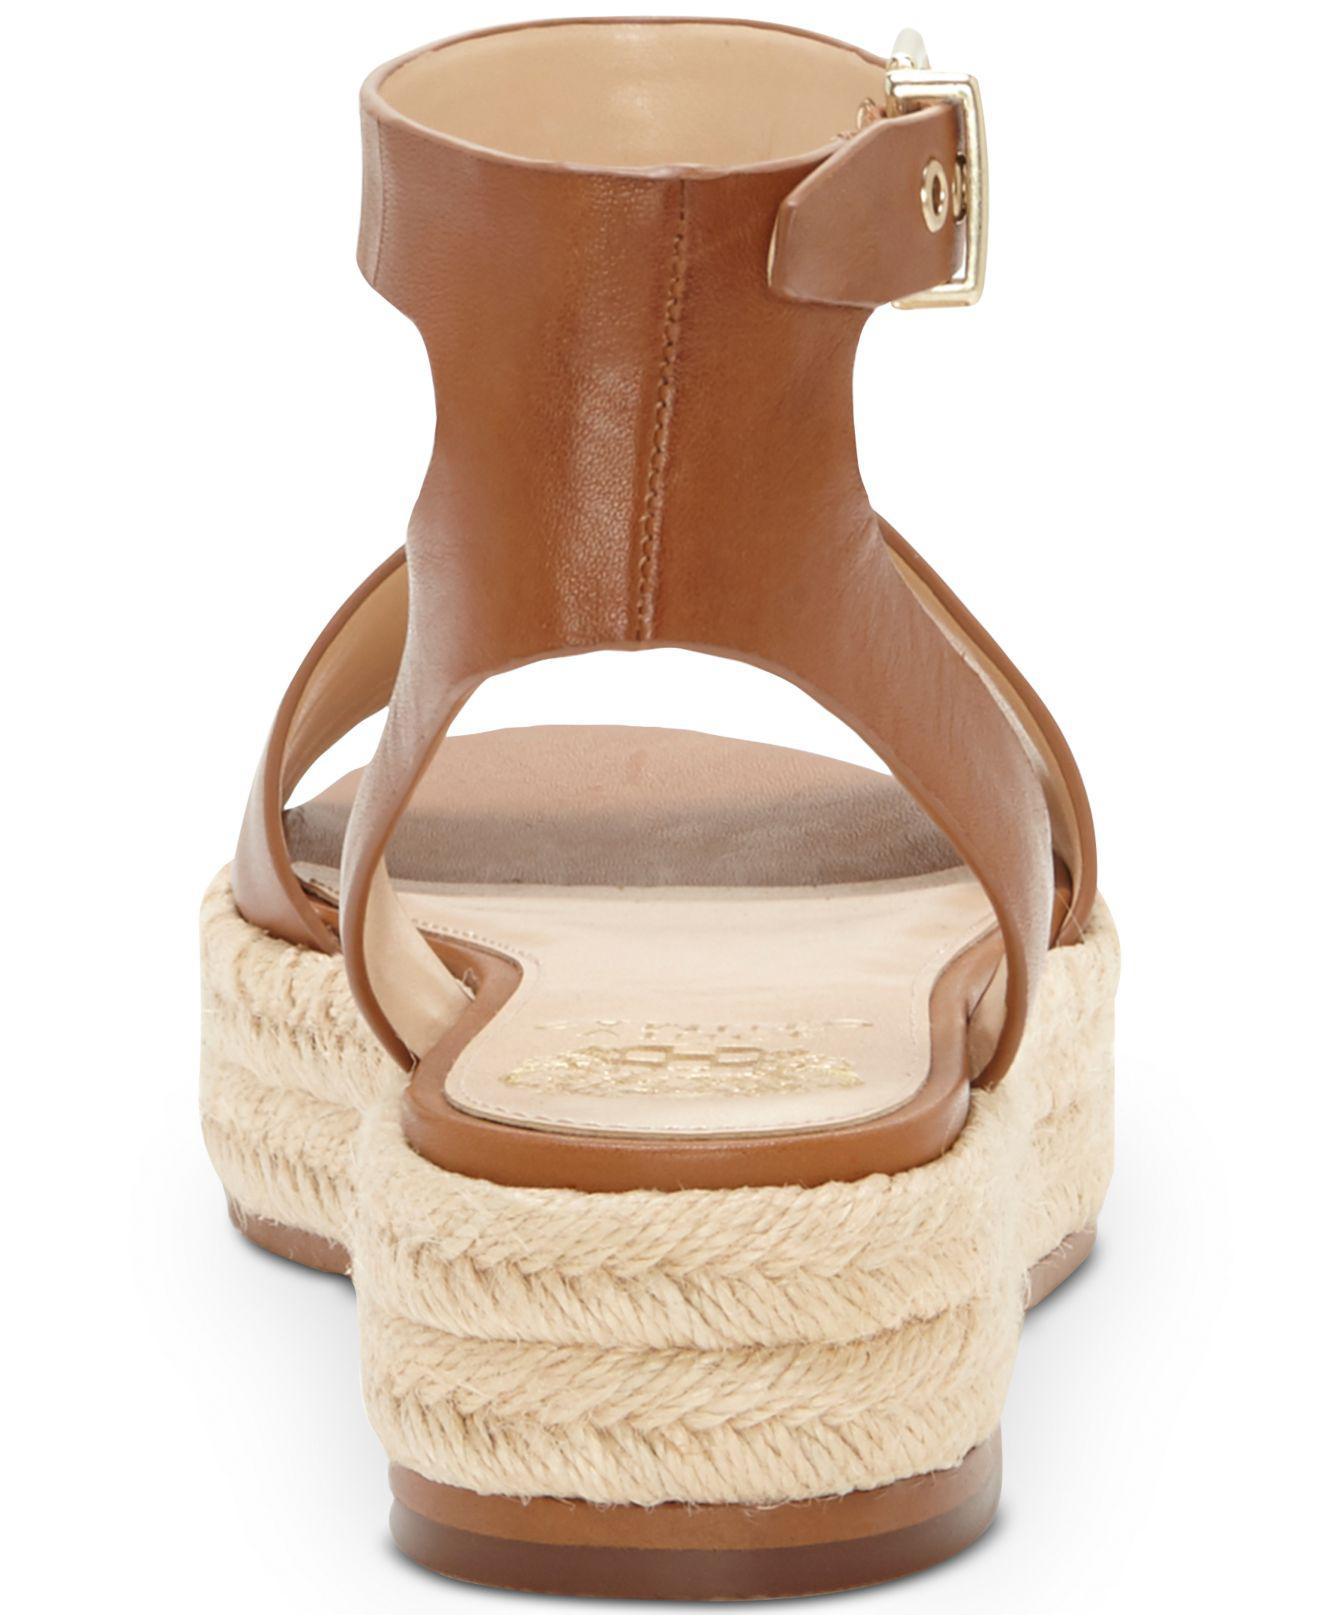 8d8b5da1f9a9 Lyst - Vince Camuto Kathalia Flatform Espadrille Sandals in Brown